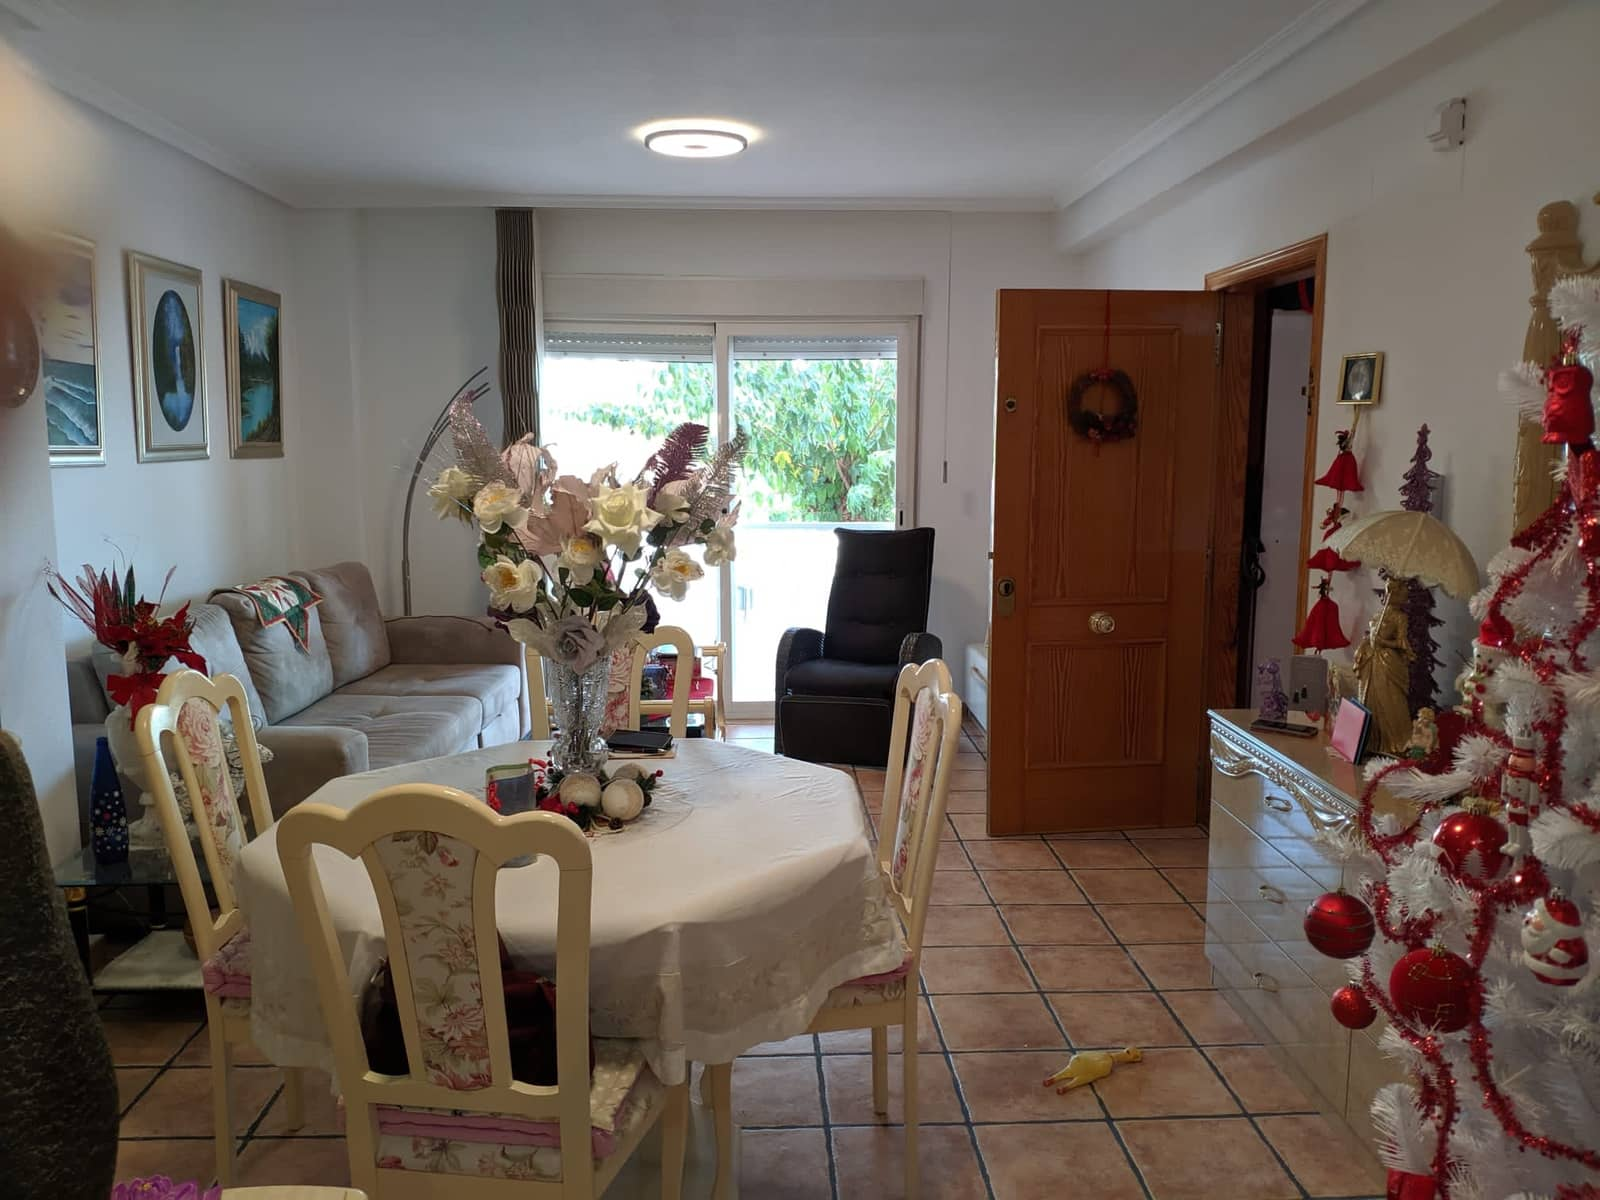 3 bedroom Apartment for sale in Bigastro with garage - € 99,000 (Ref: 5003588)